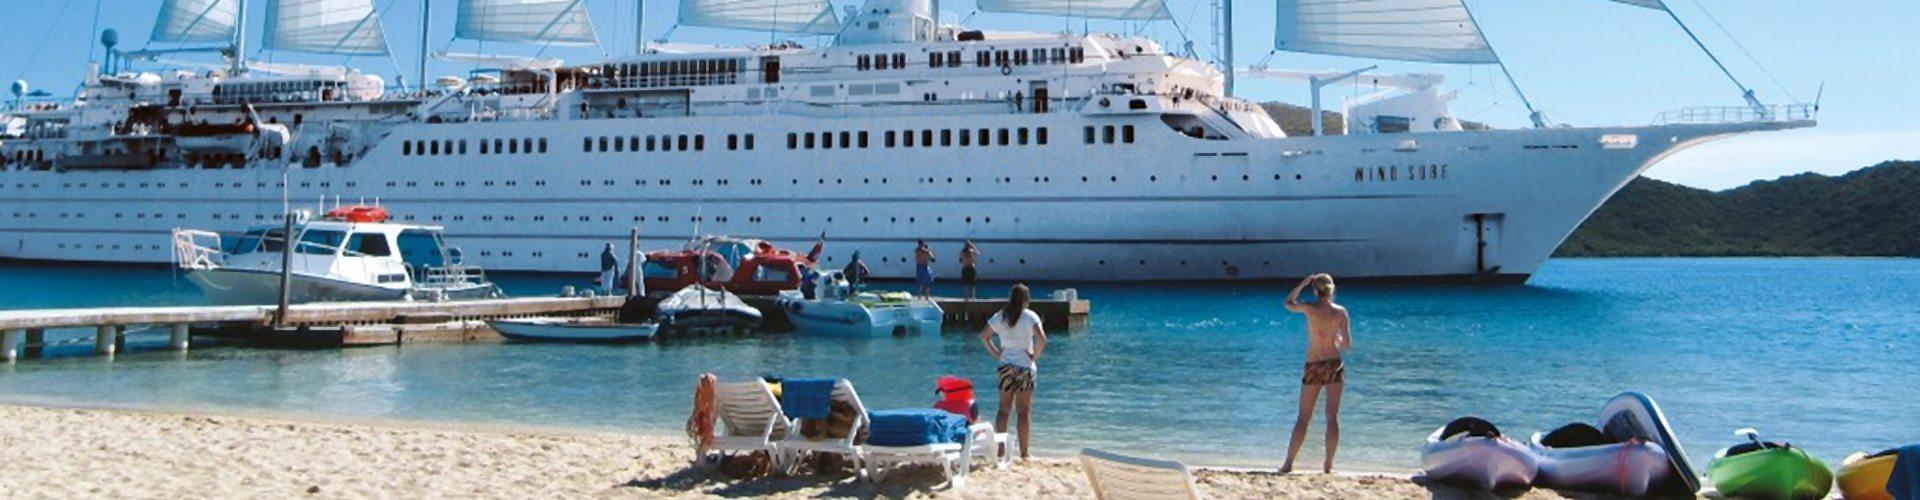 Windstar Cruises Segelschiff